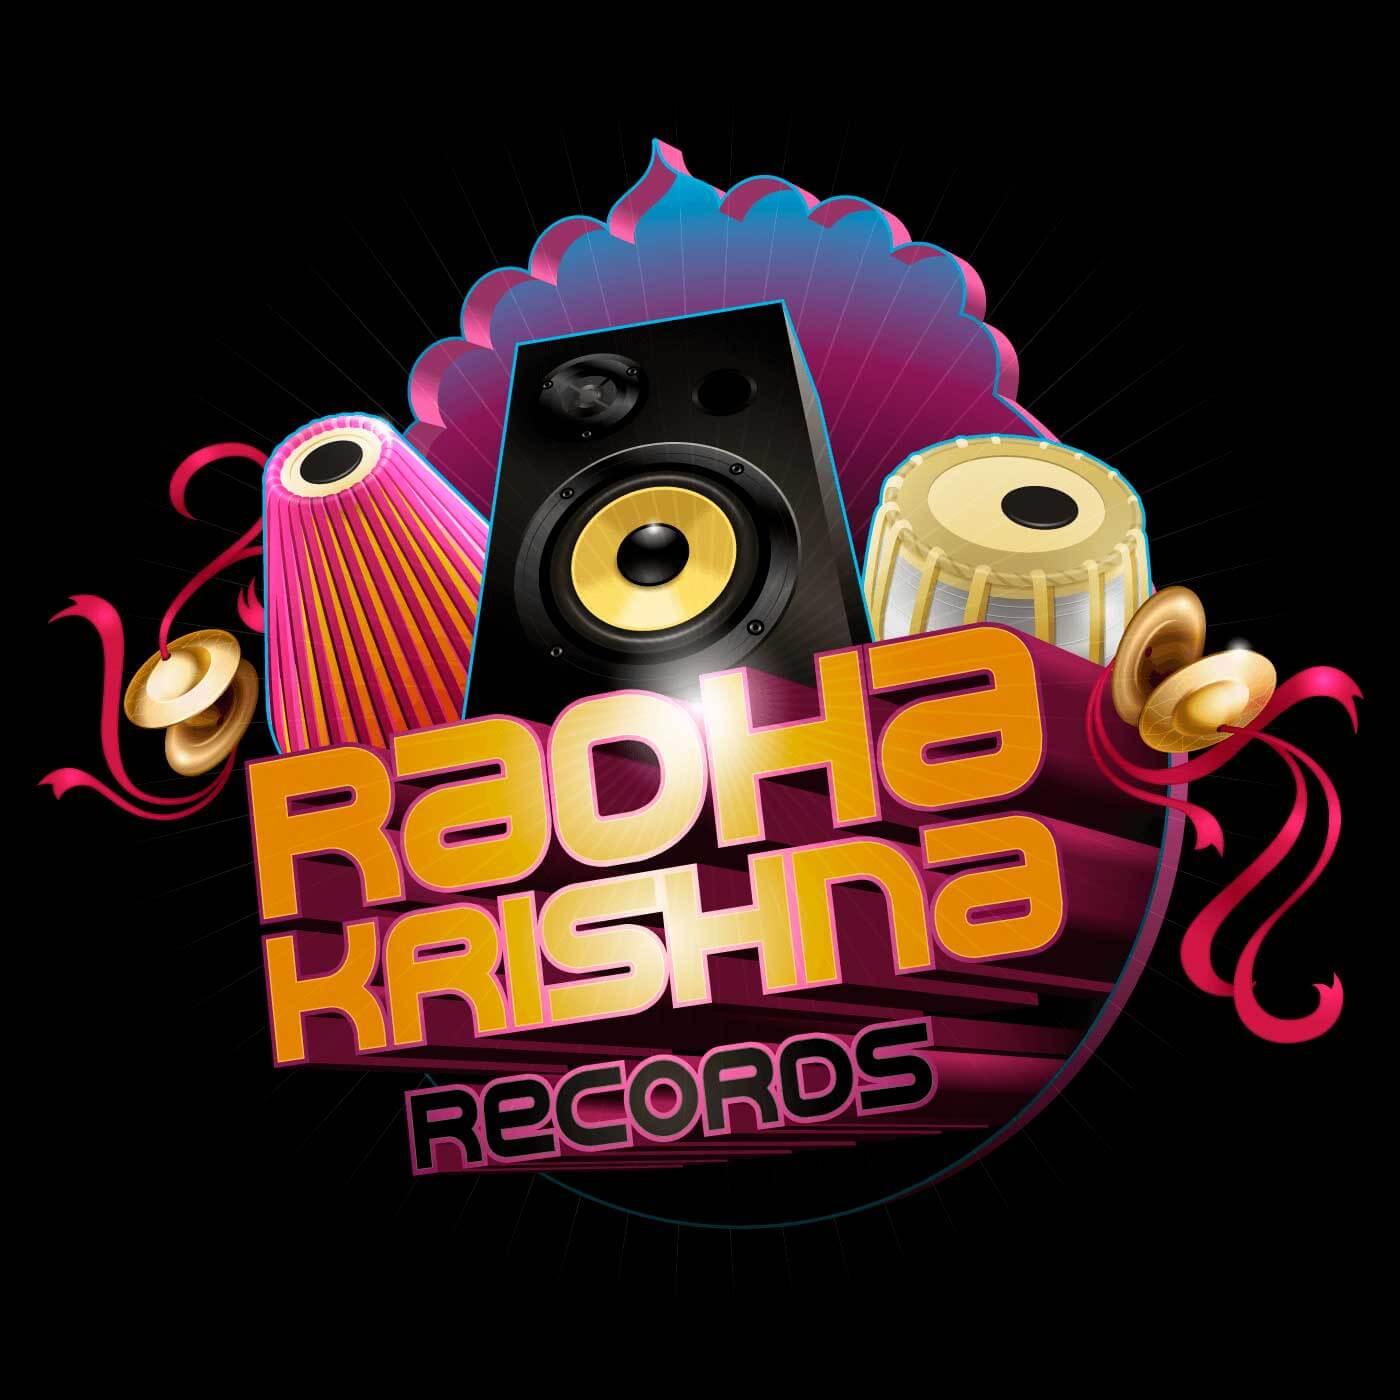 Radha Krishna Records - Final illustrated logo - Created in Adobe Illustrator